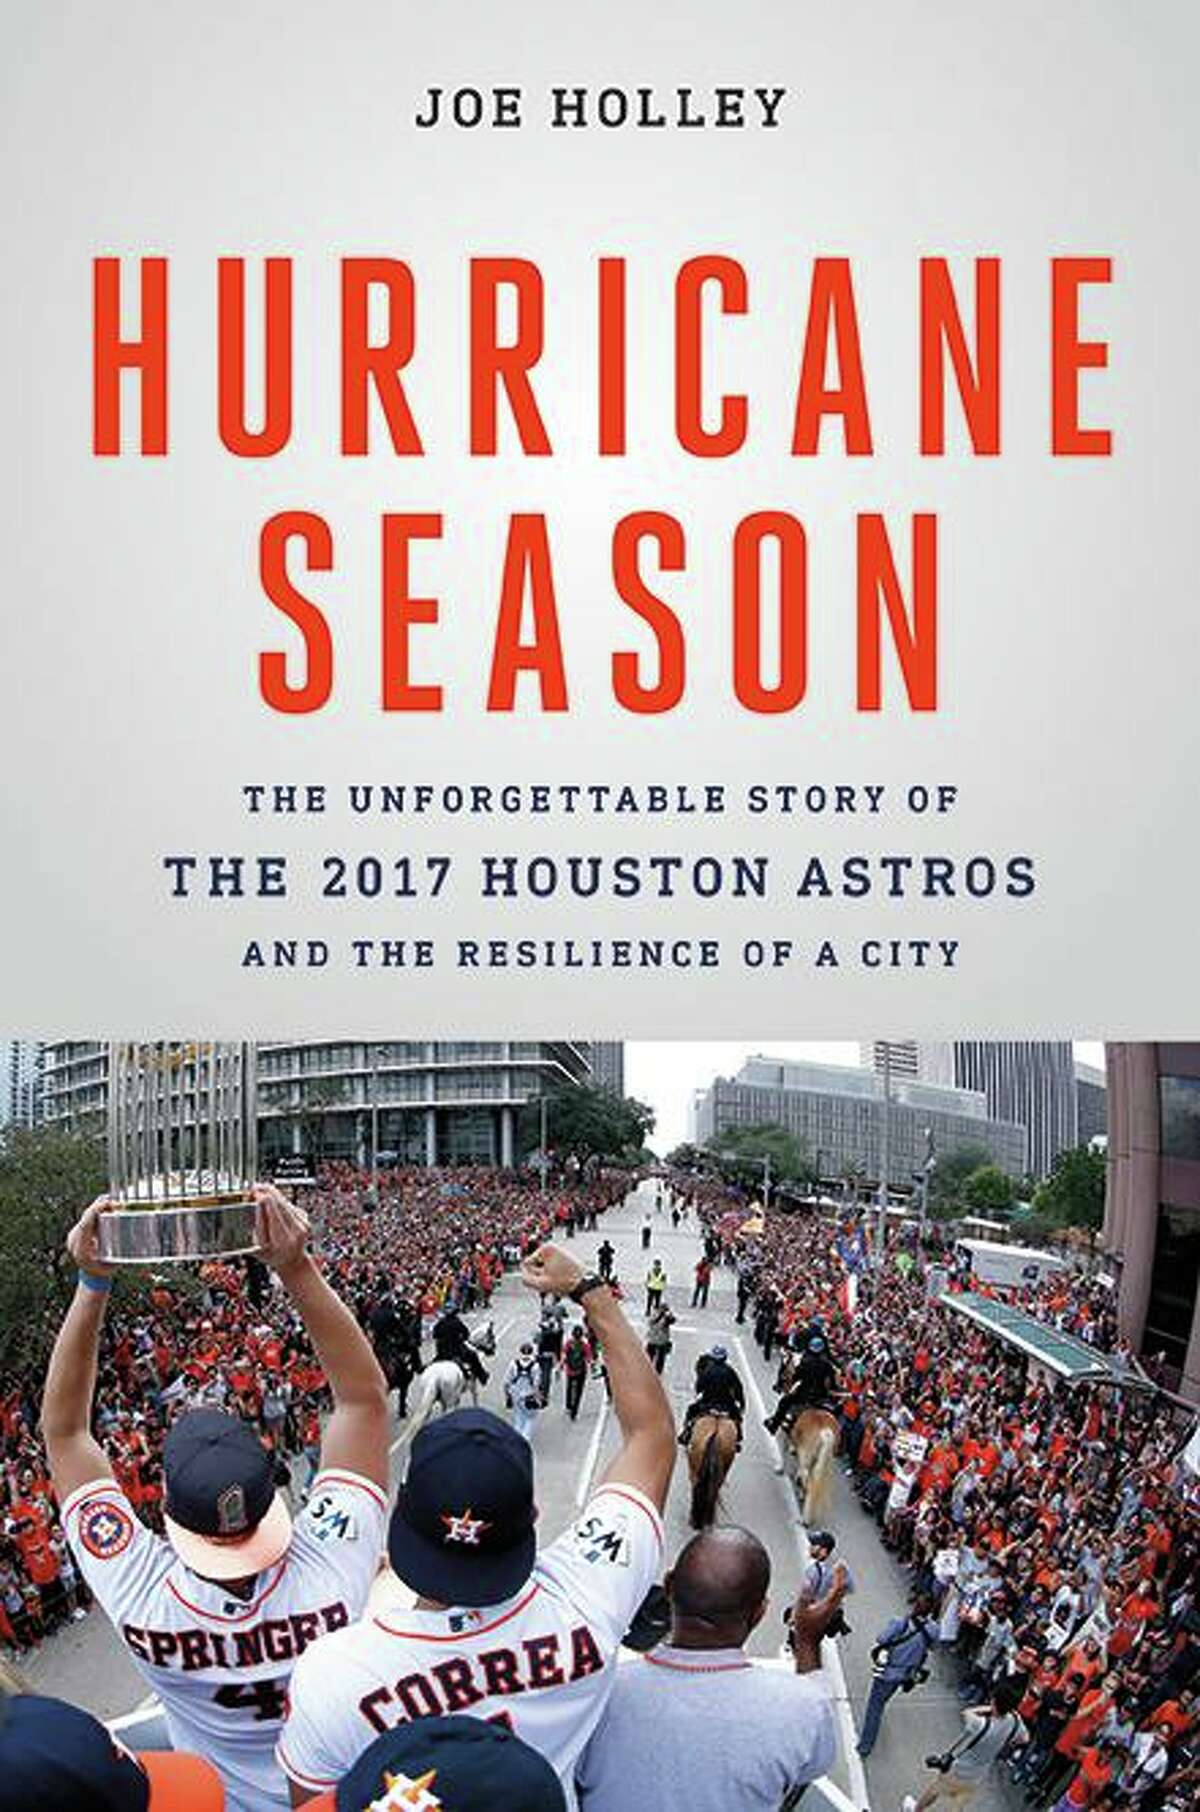 Hurricane Season by Joe Holley